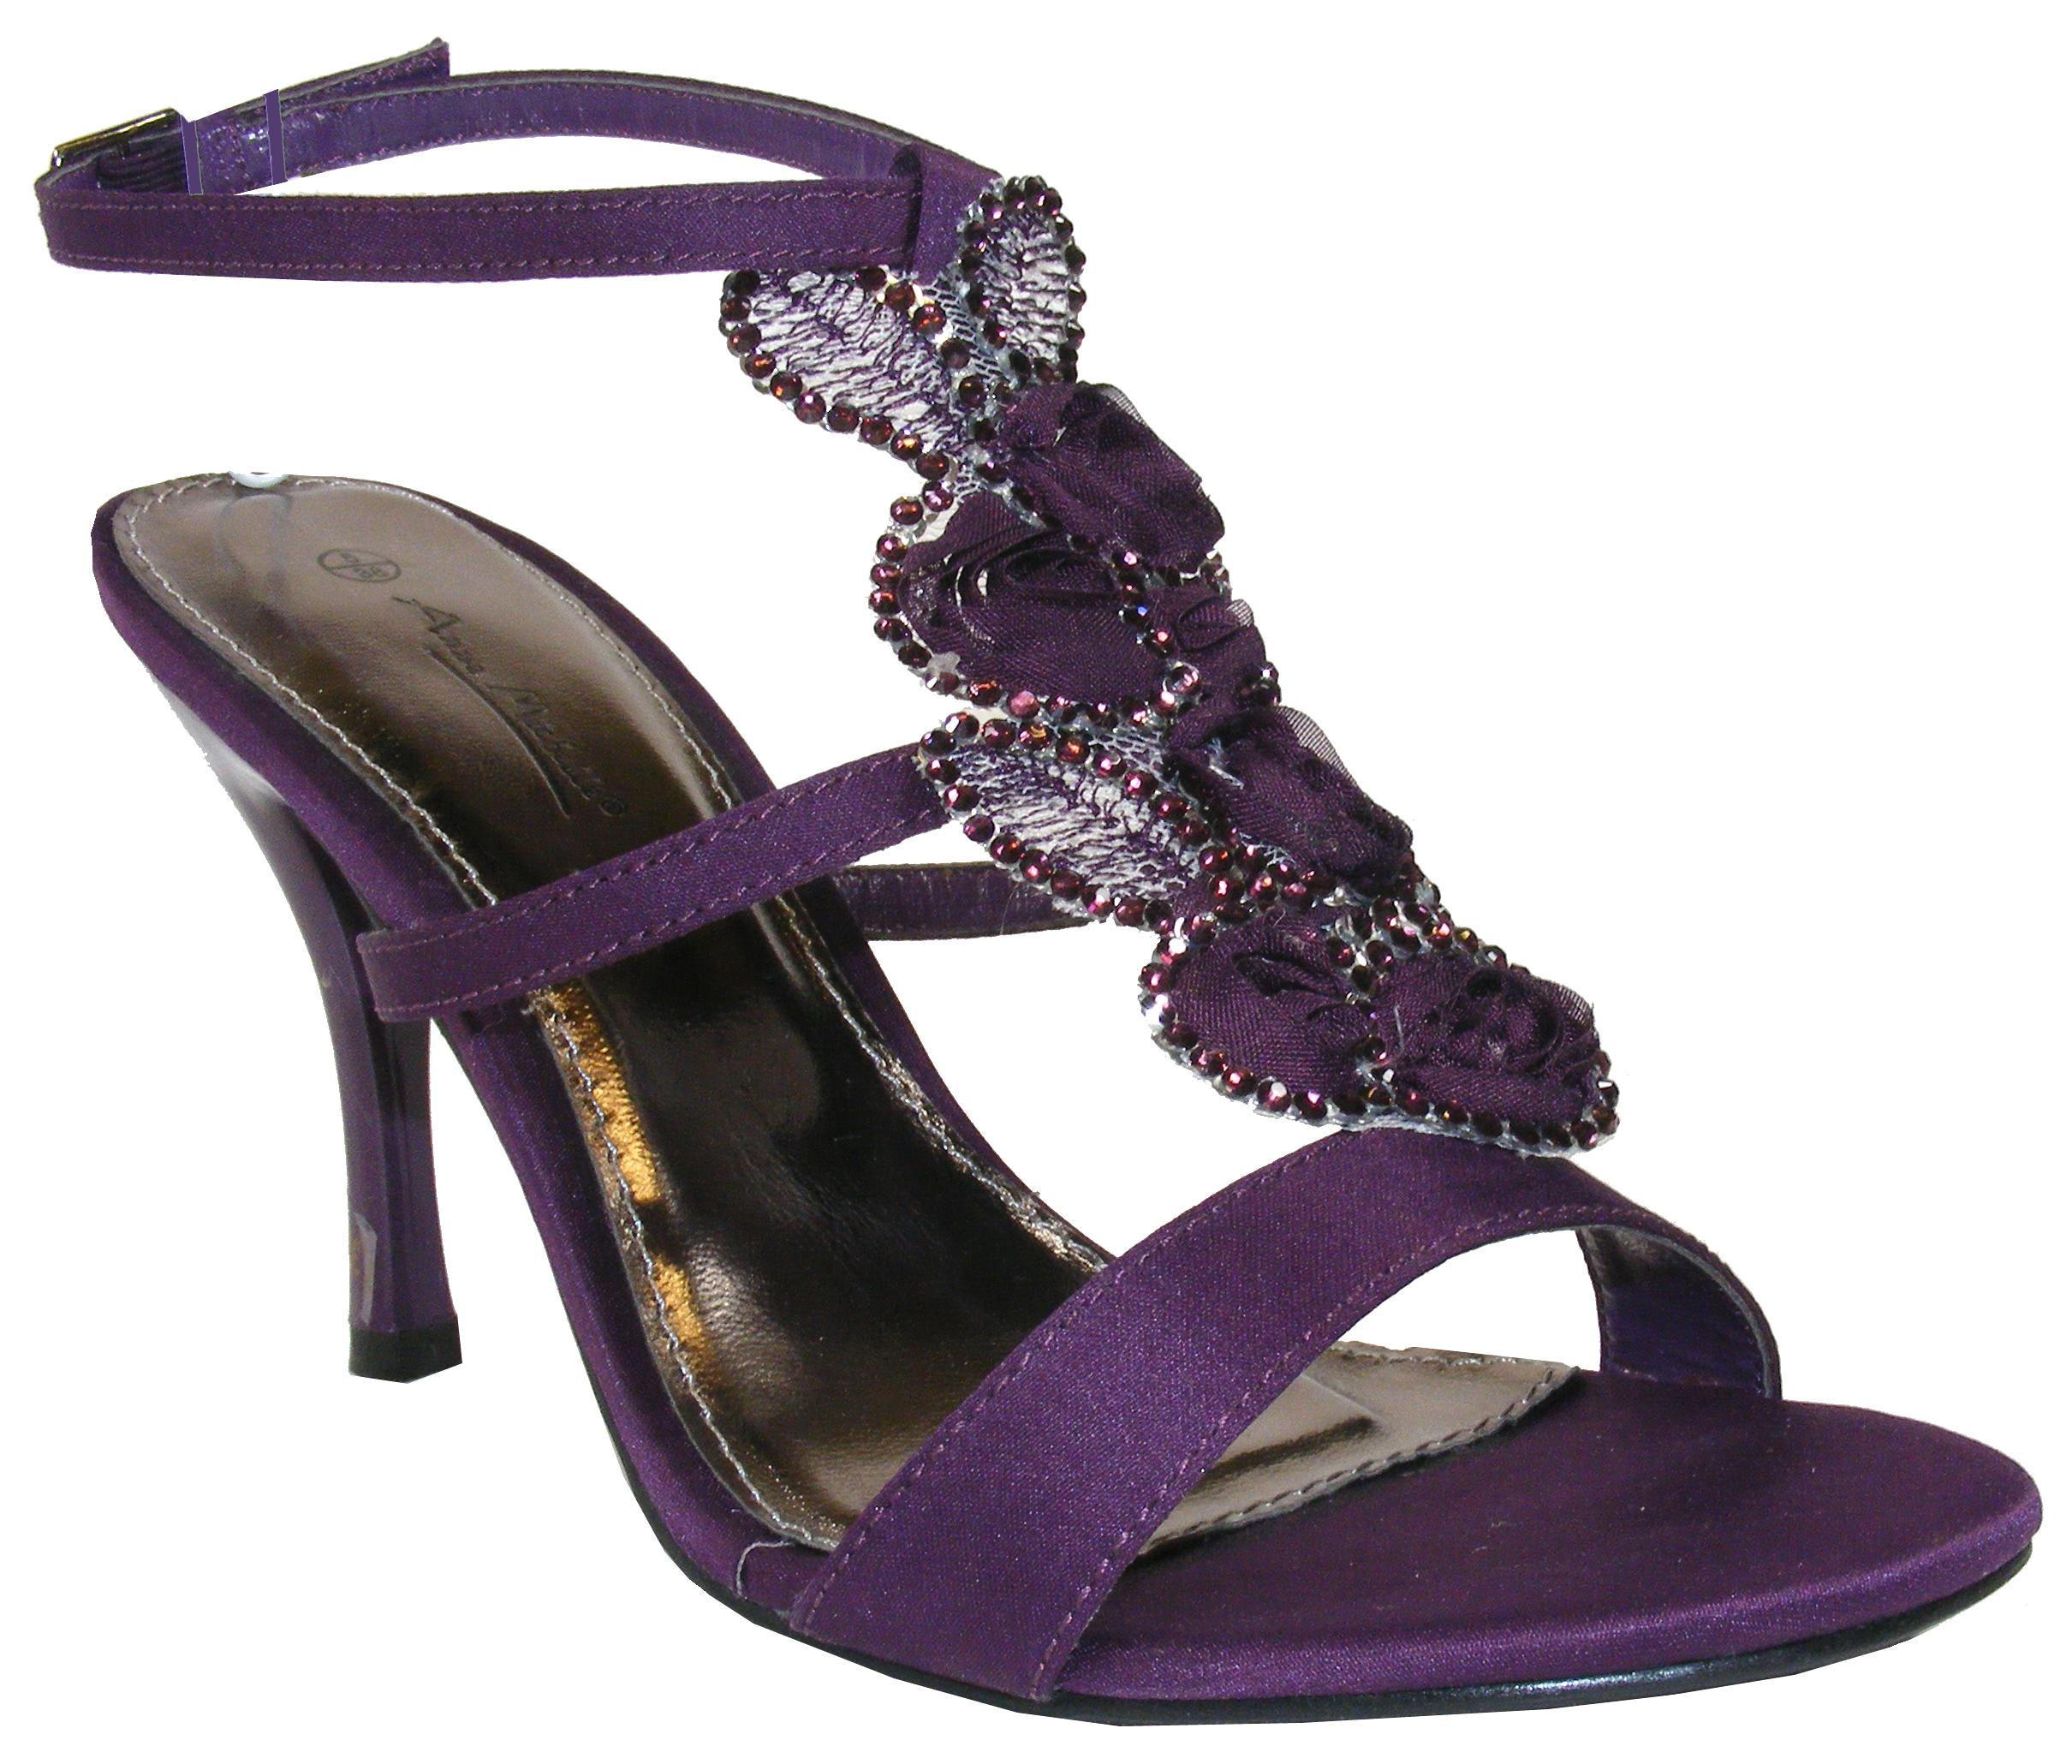 NEW Ladies Plum Purple Satin Flowery Diamante Bridesmaids Shoes Wedding Heels